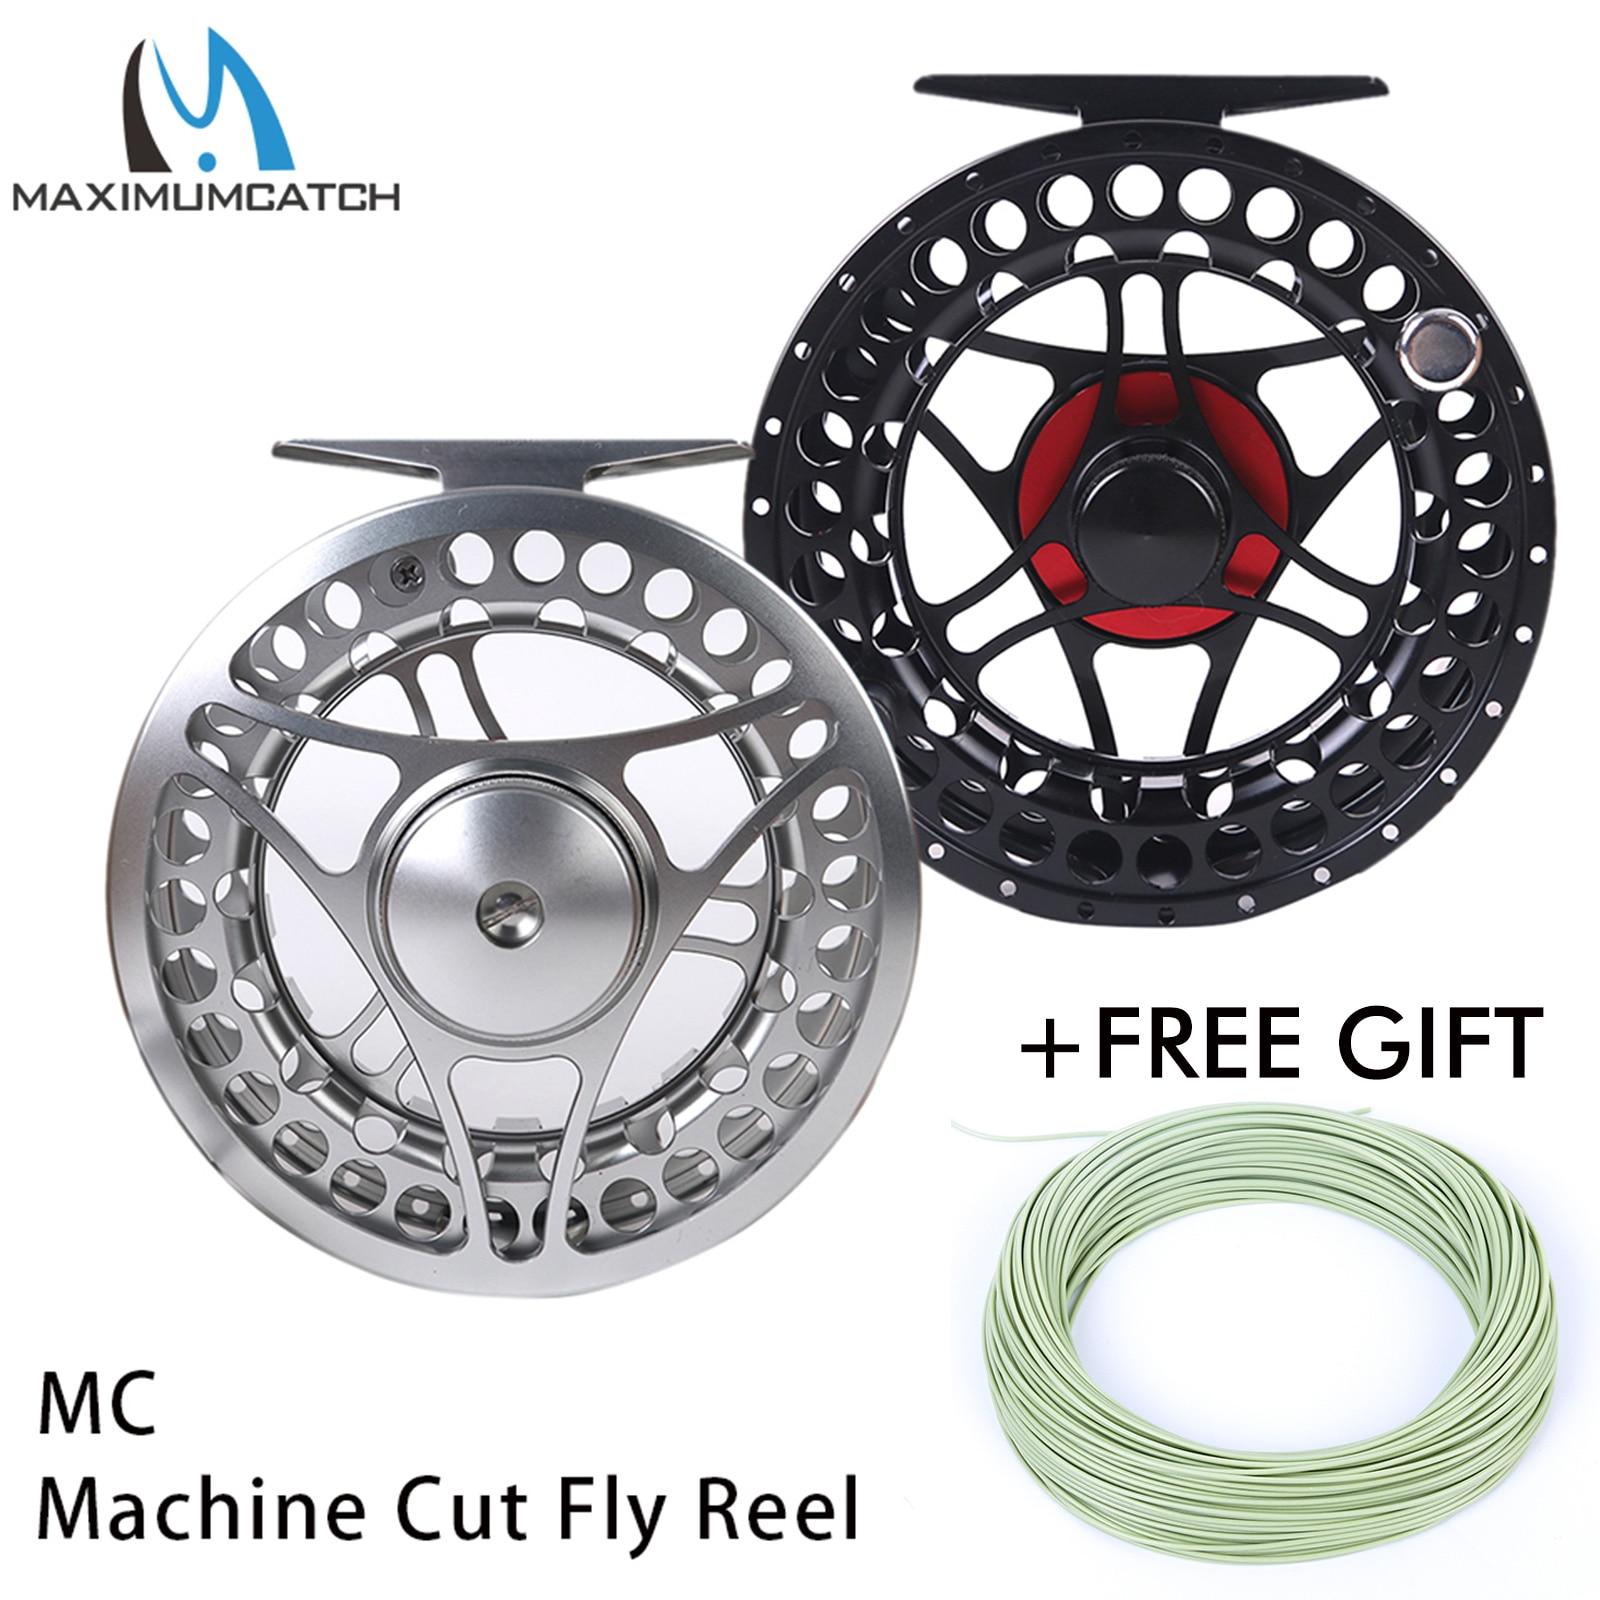 Maximumcatch 2 11WT Fly Fishing Reel CNC Machine Cut Large Arbor Aluminum Fly Reel